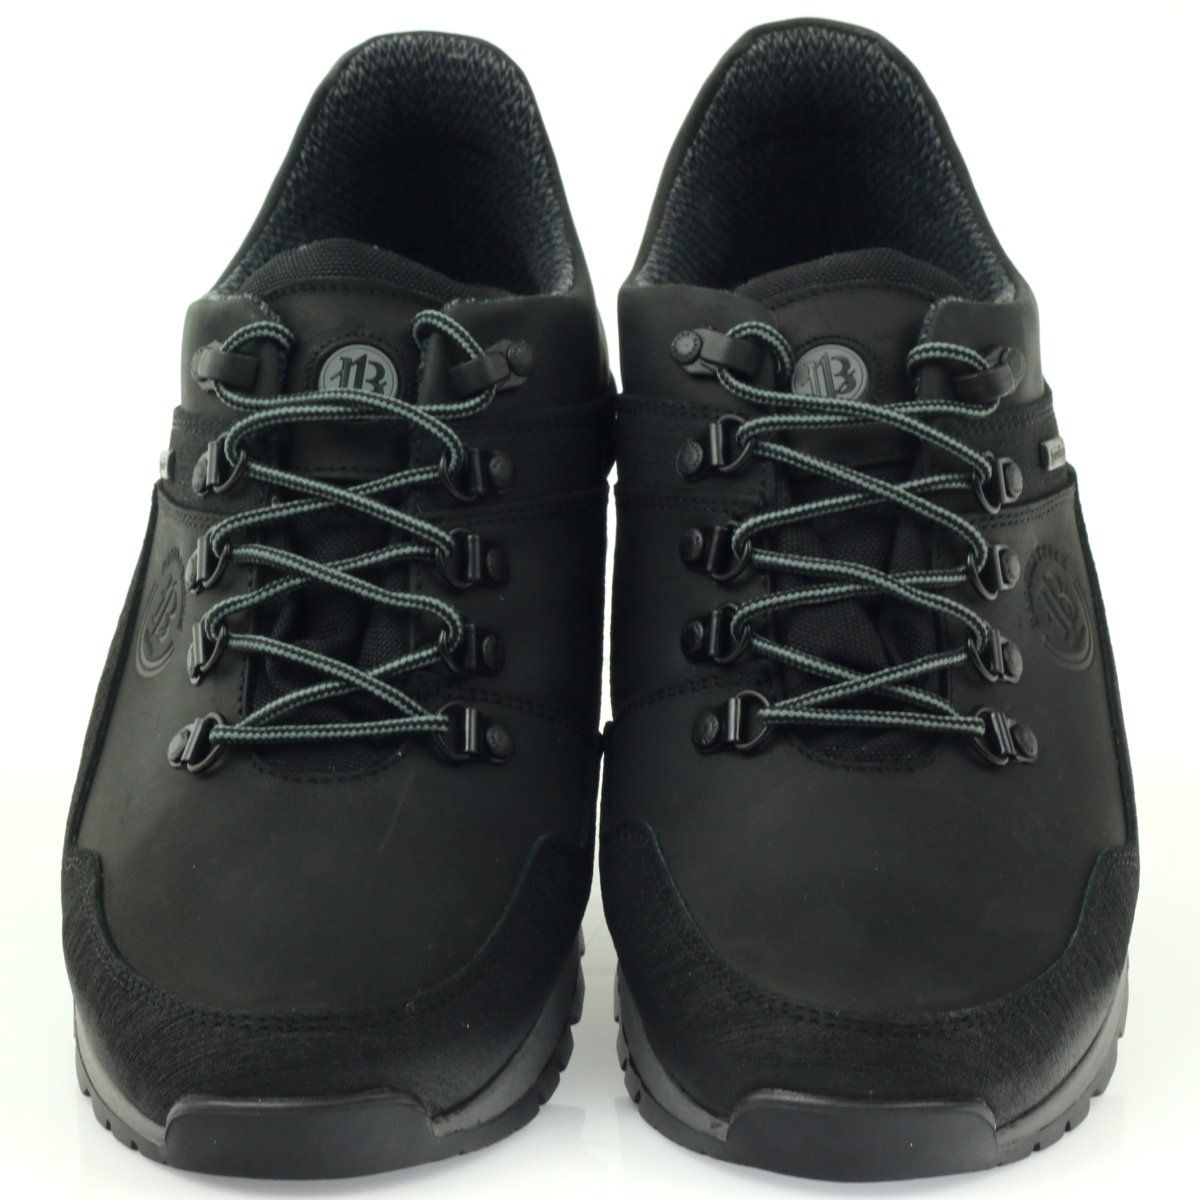 Trekkingi Z Membrana Sympatex Badura 3141 Czarne Trekking Shoes Leather Heels Shoes Mens